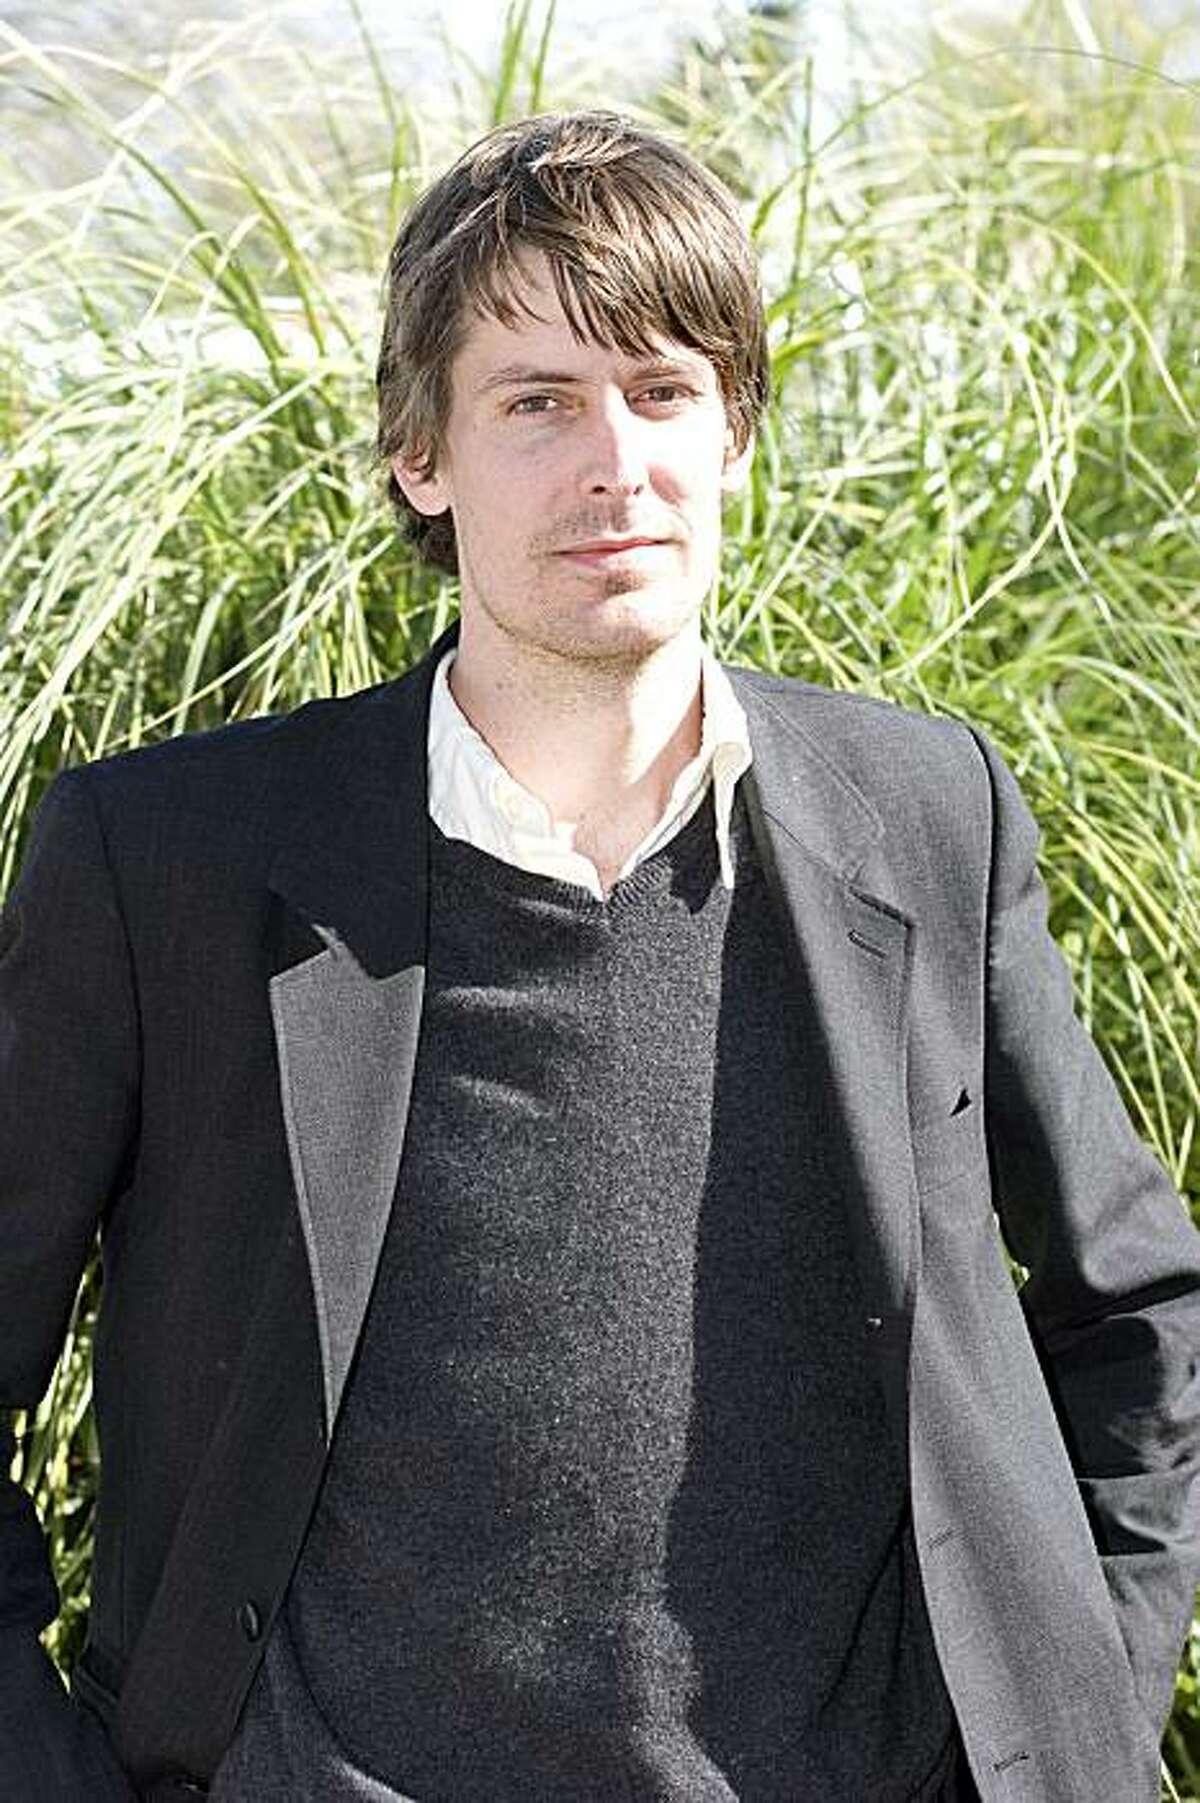 Stephen Malkmus appears at Noise Pop 2009